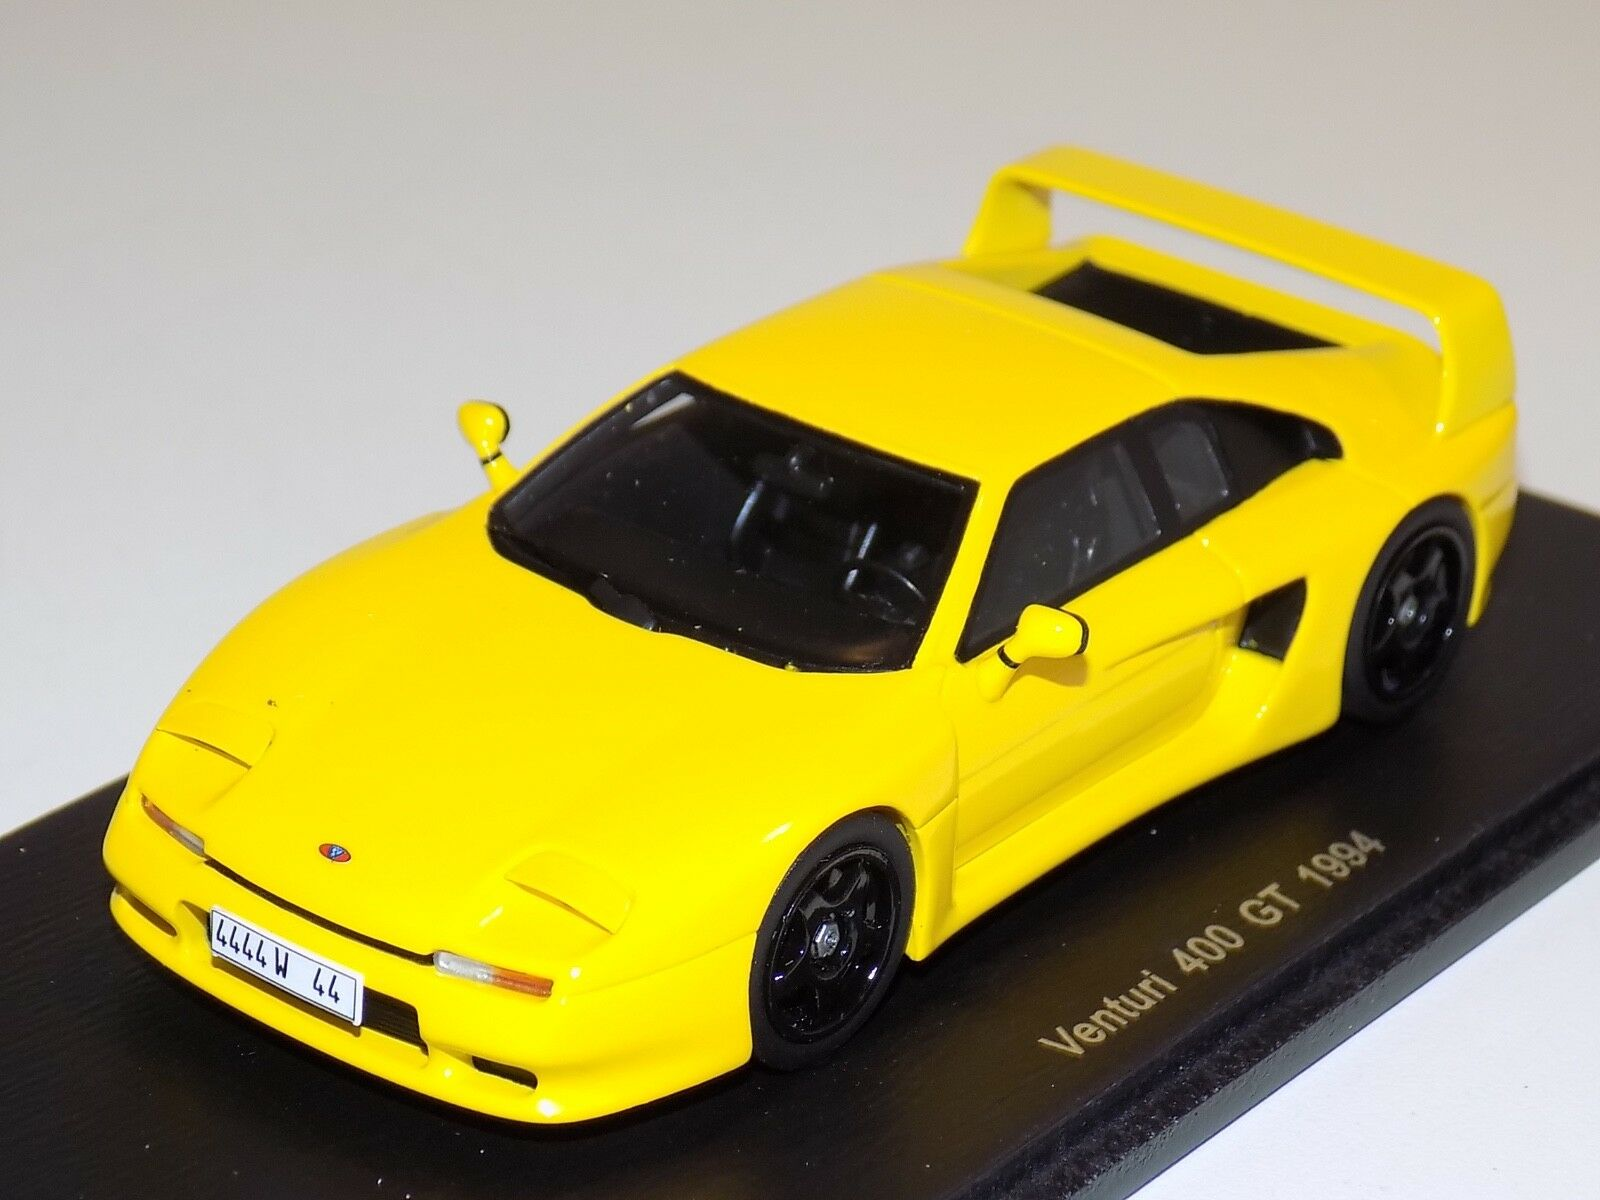 1/43 Spark Street Venturi 400 Gt 1994 in Yellow S2246